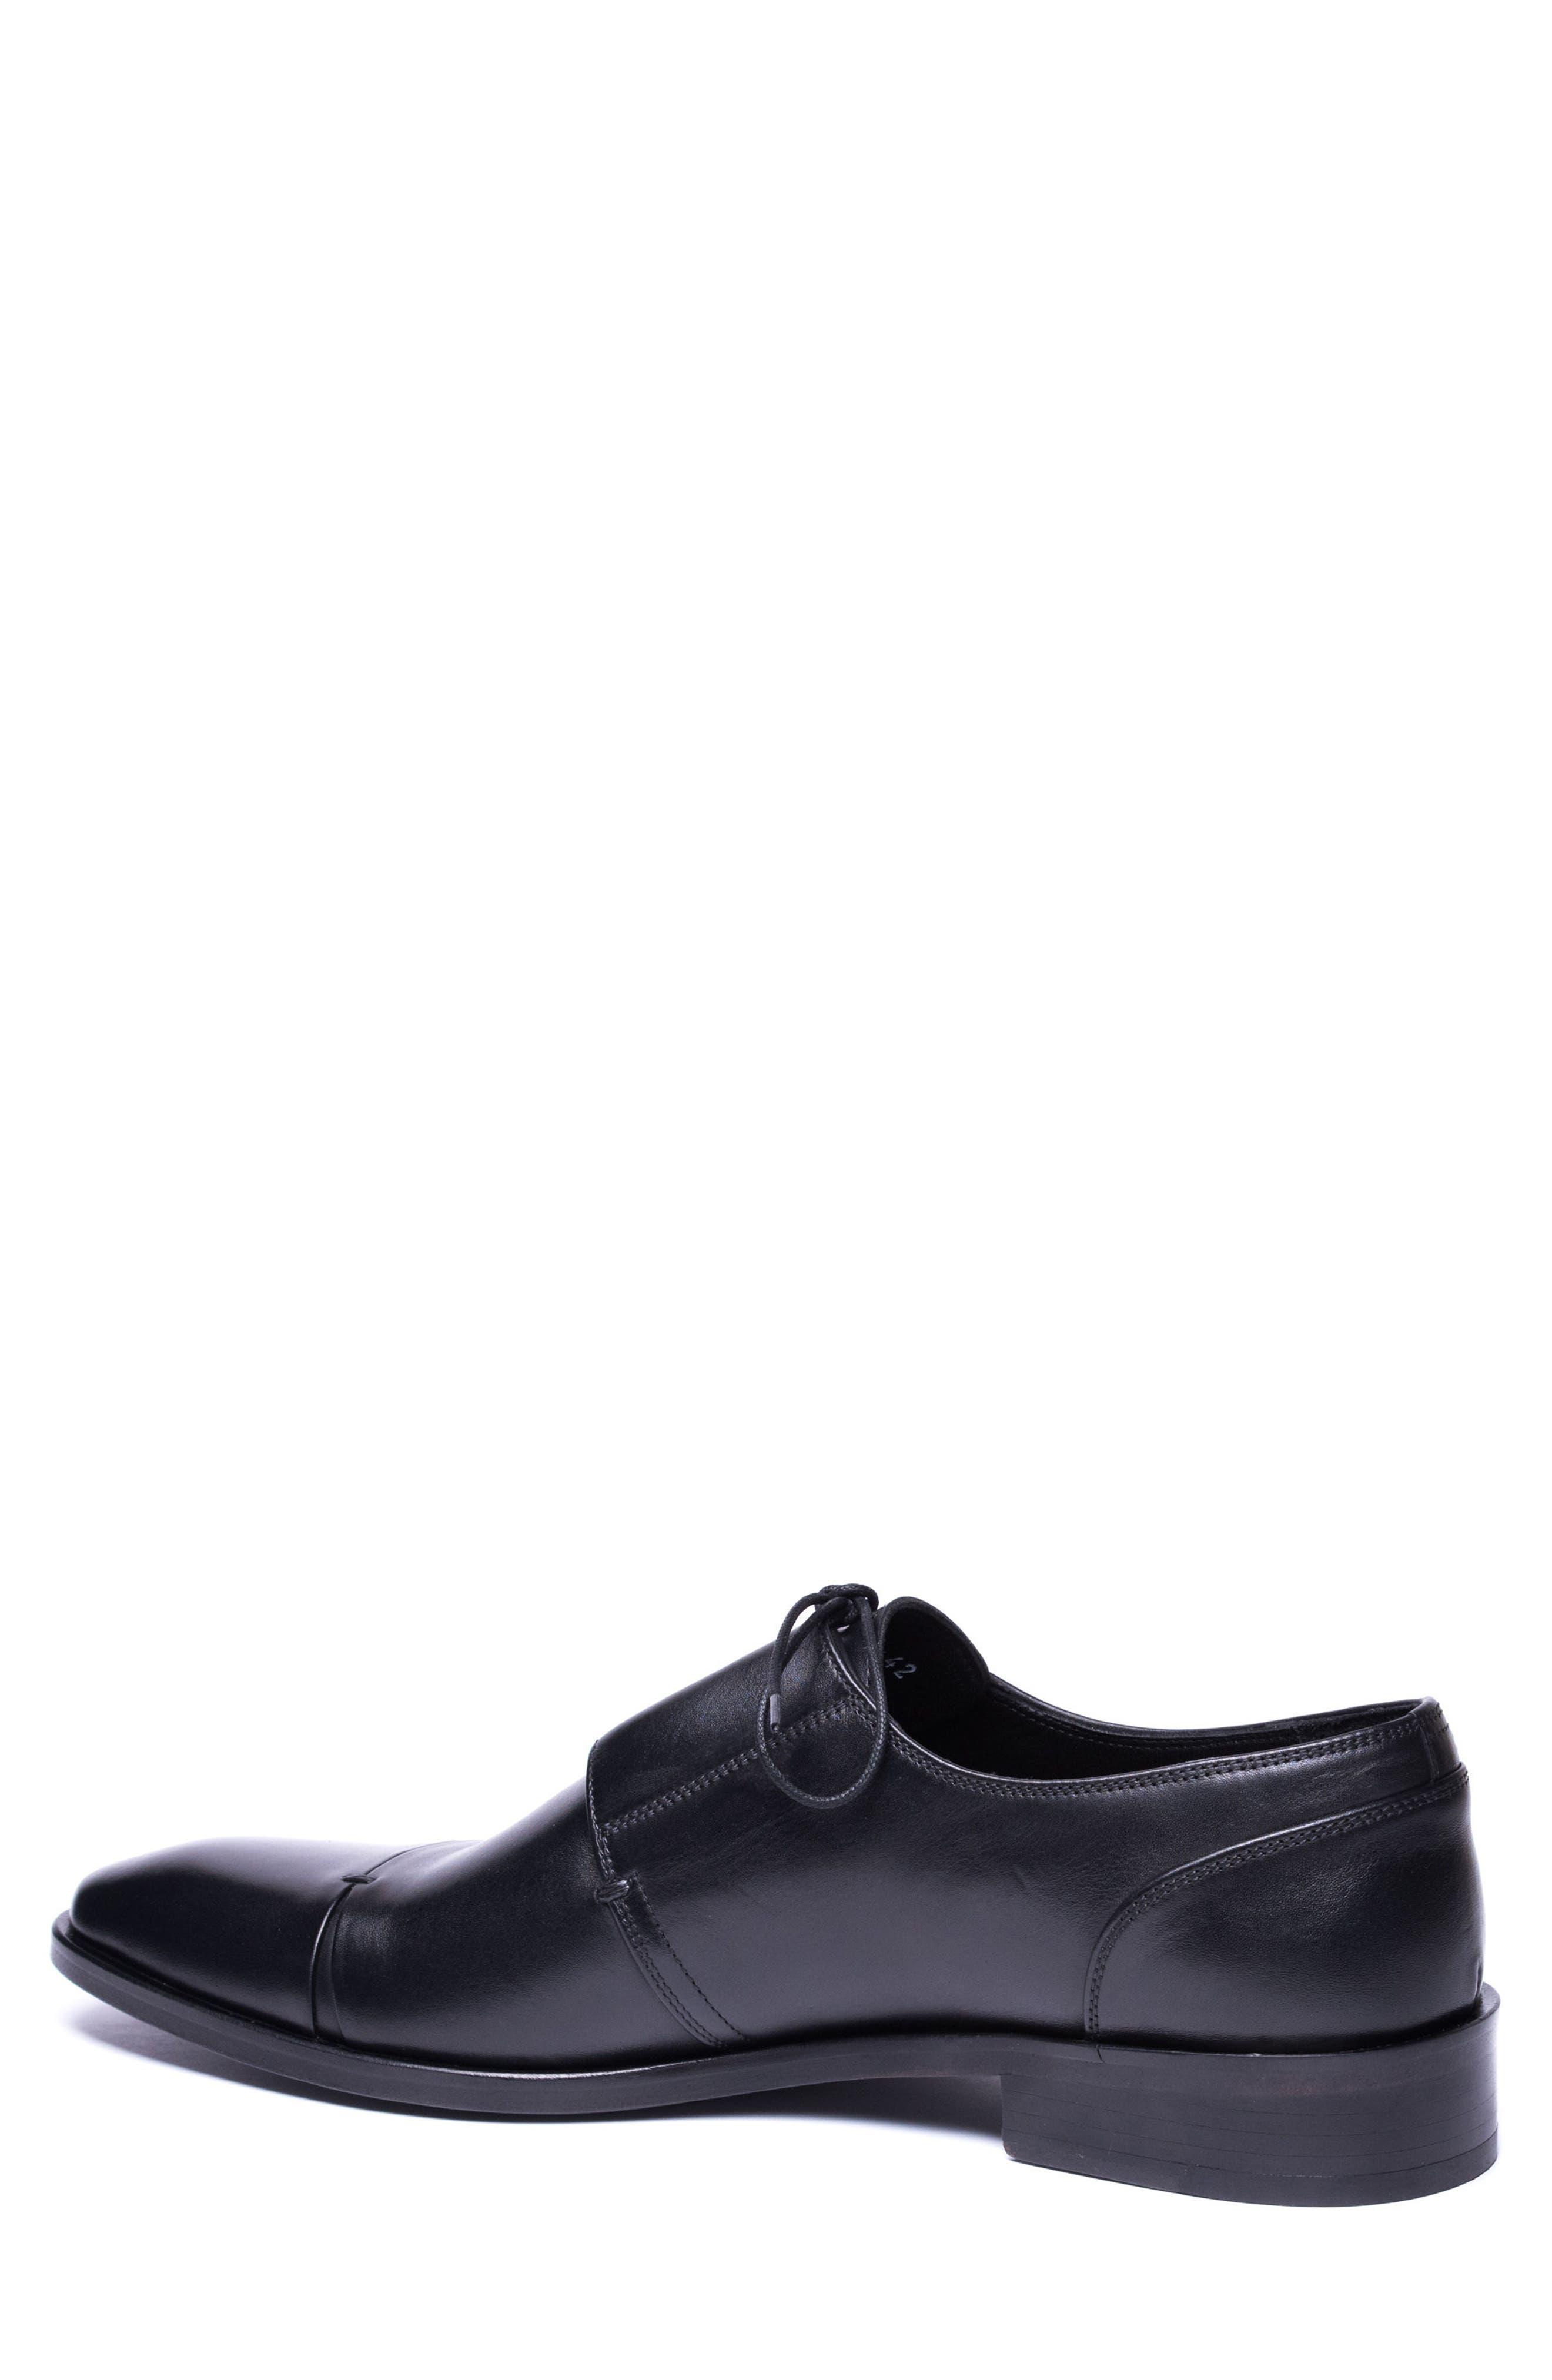 Danny Cap Toe Derby,                             Alternate thumbnail 2, color,                             Black Leather